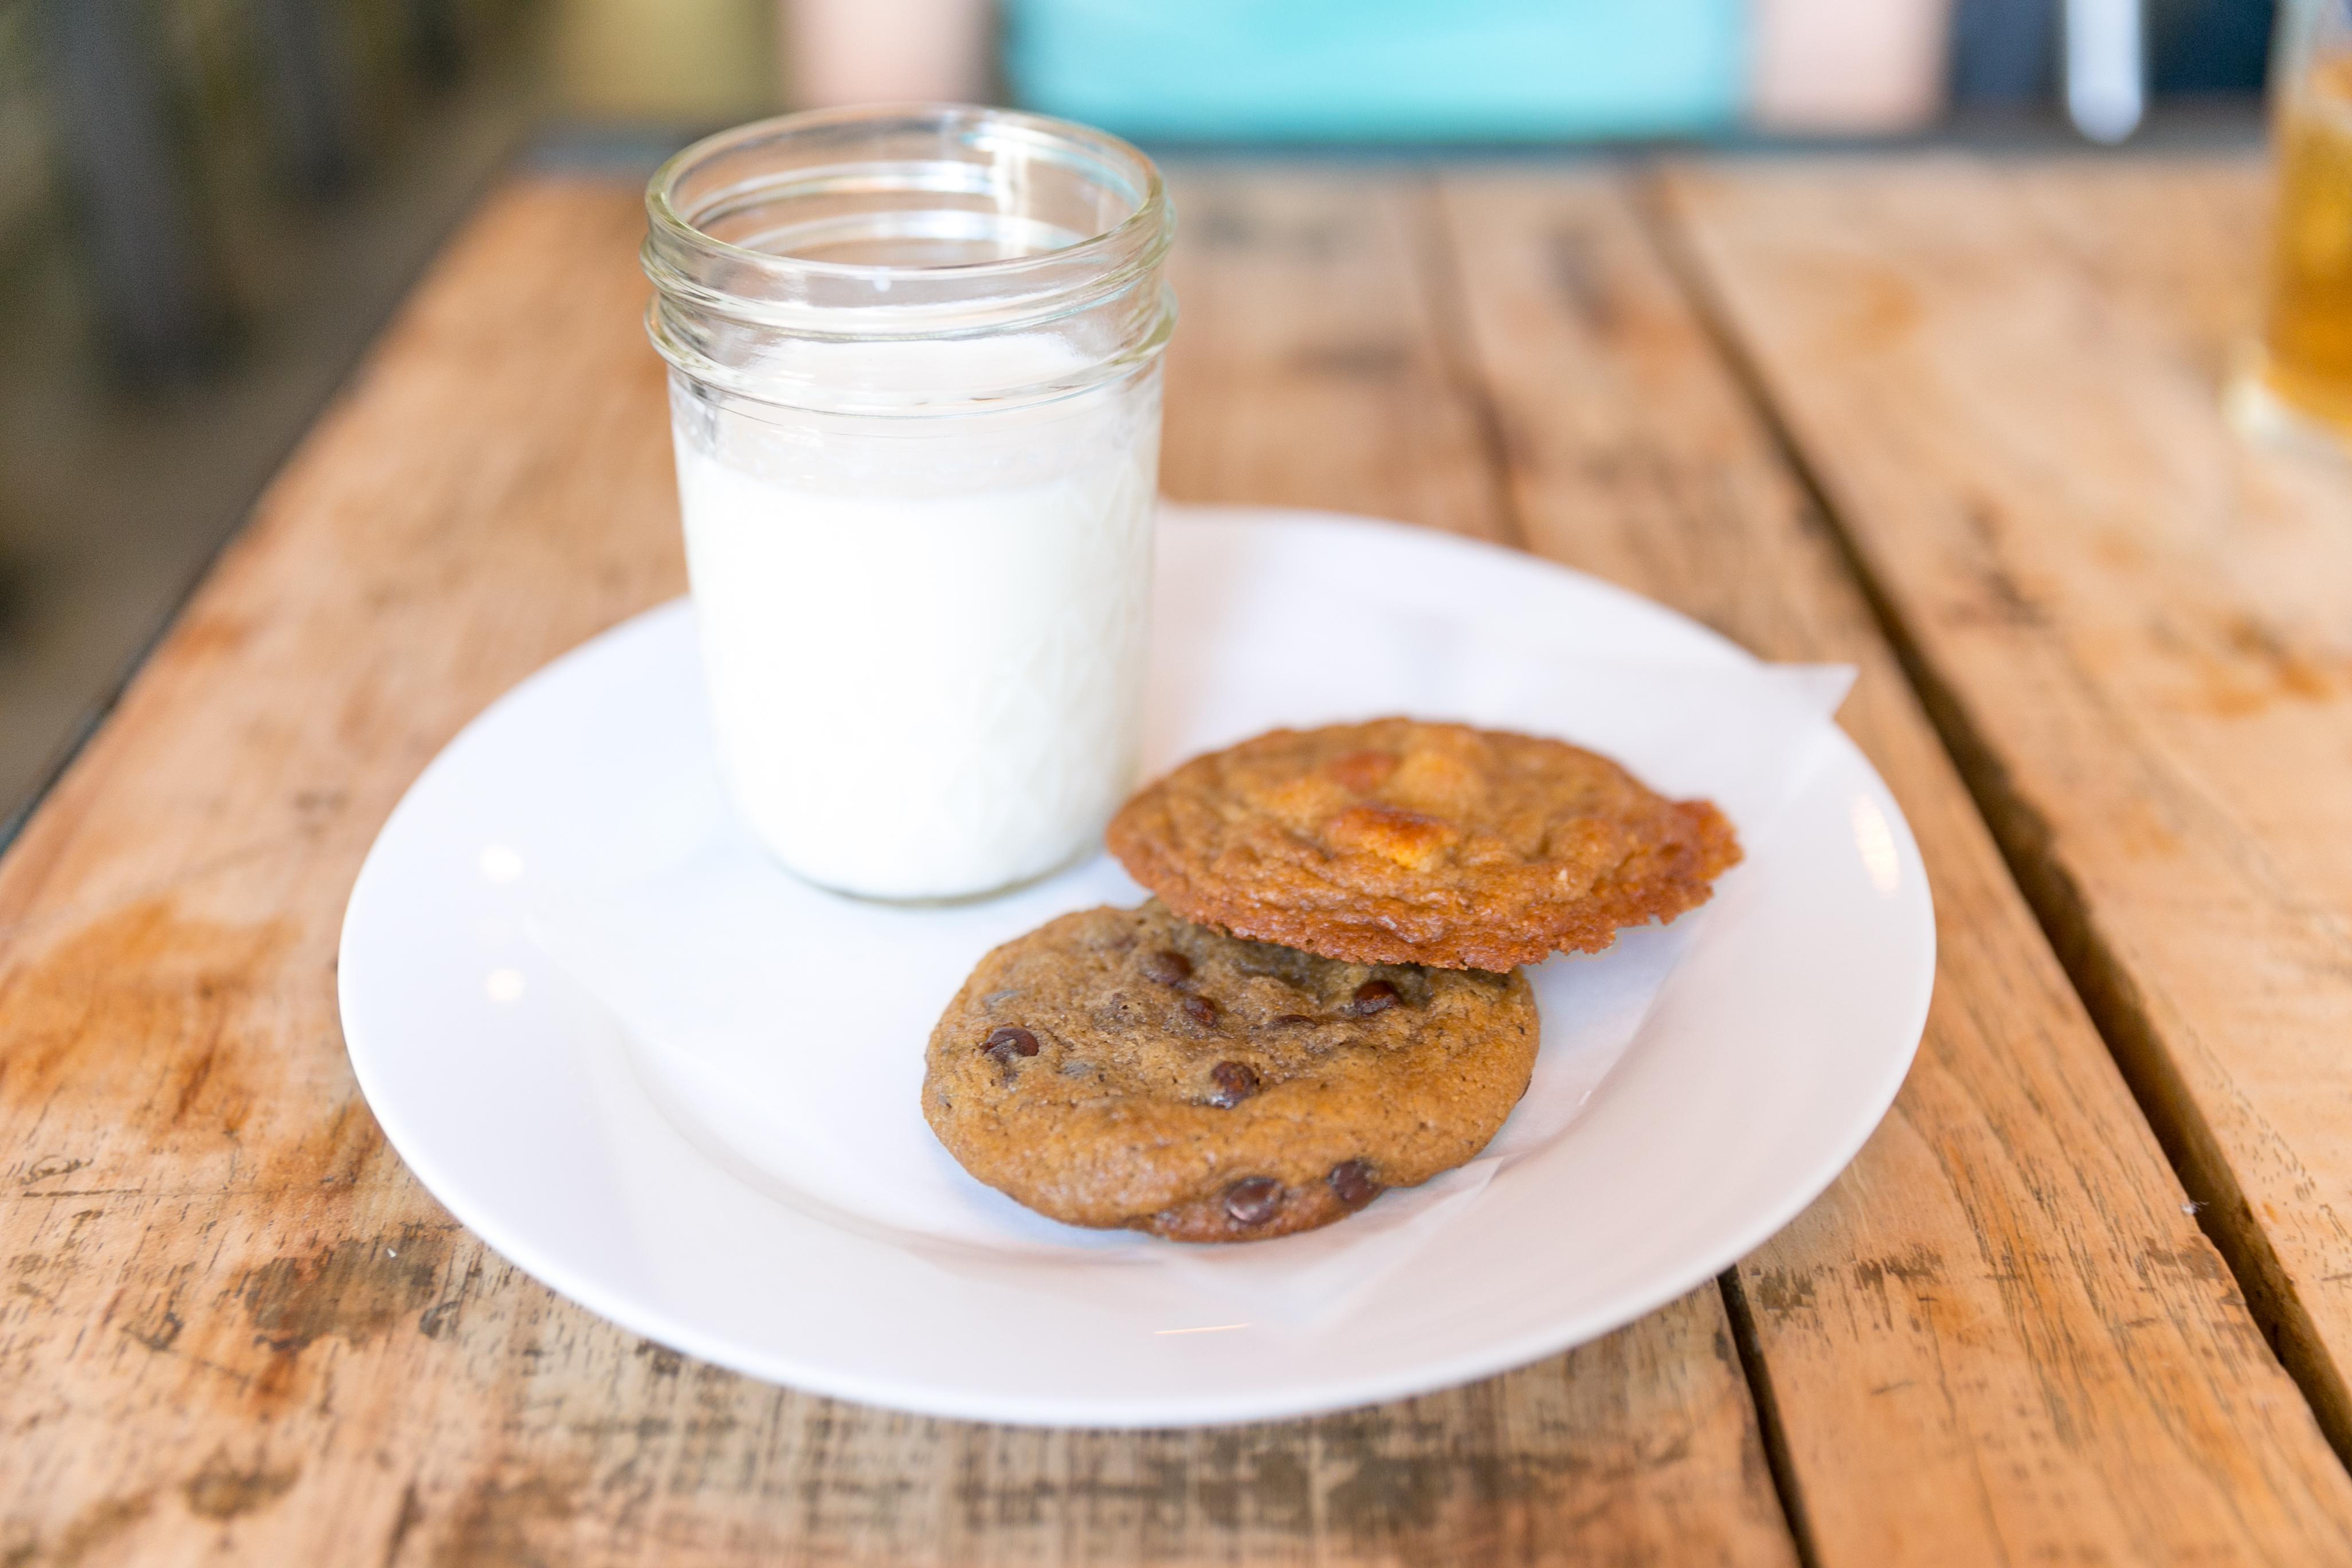 Cookies & Milk - Chocolate chip sea salt, marshmallow crunch